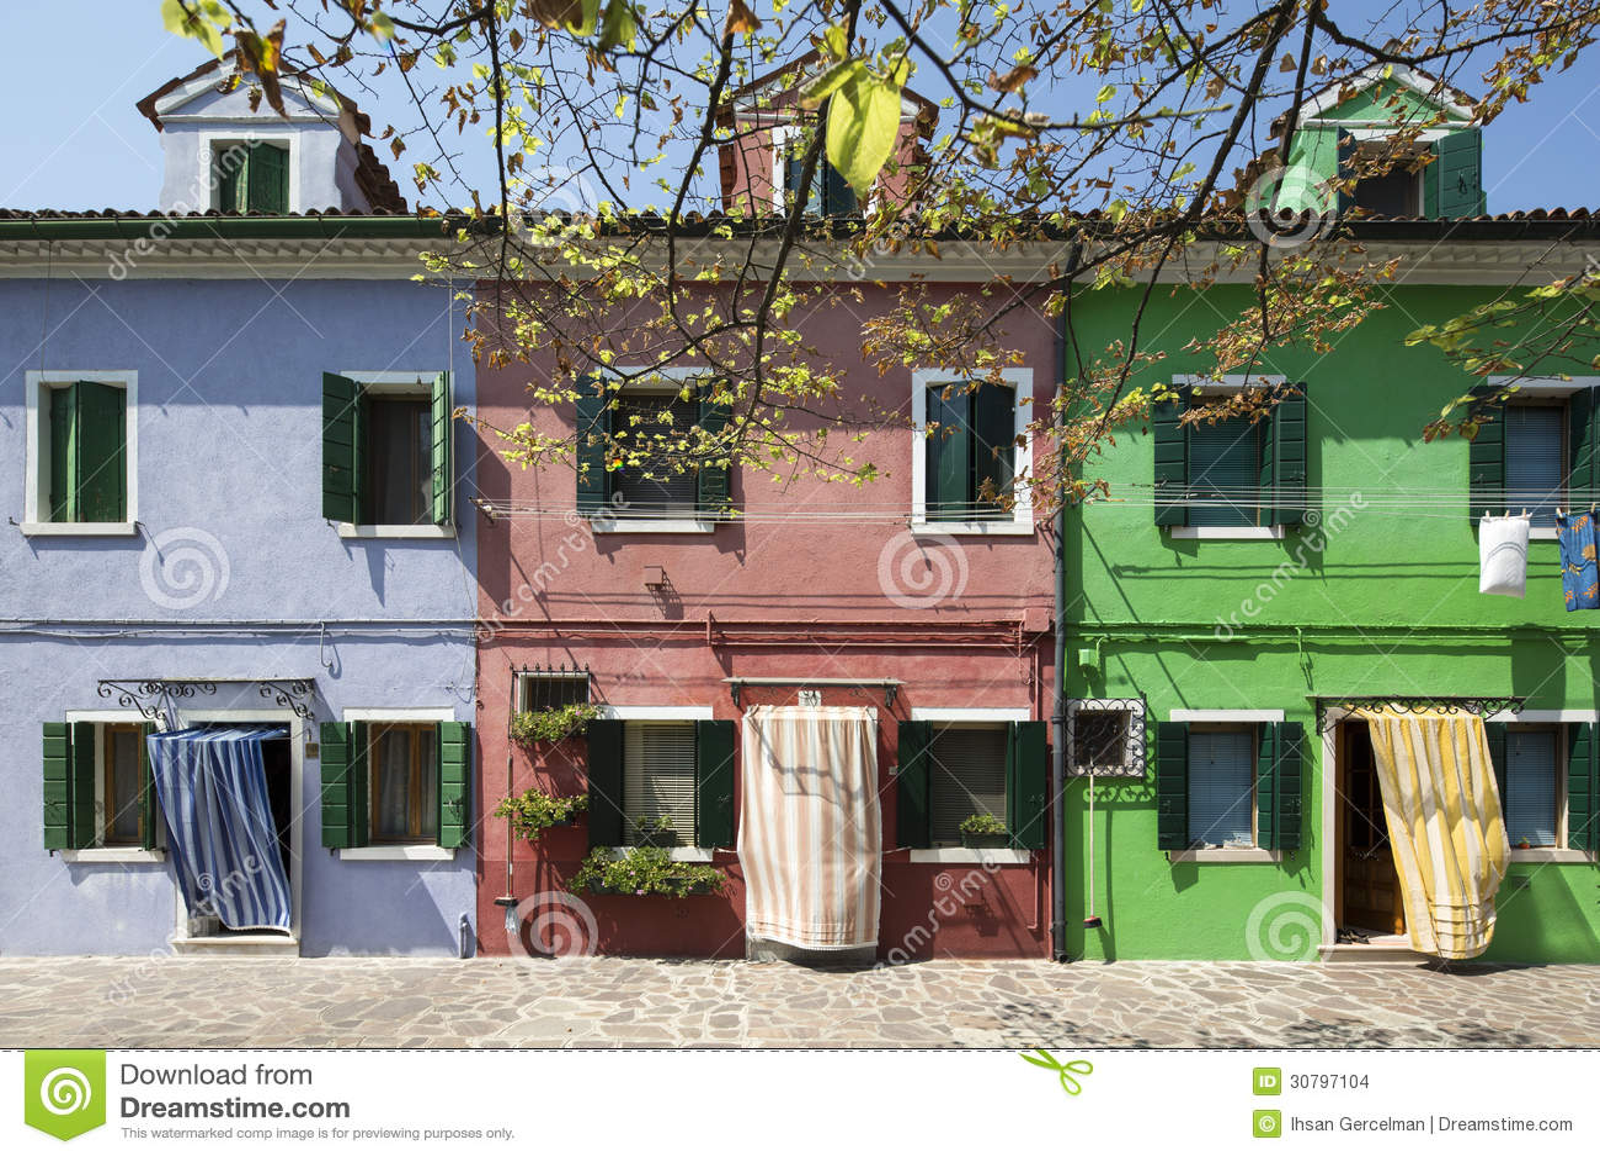 colorful-houses-burano-islan-venice-italy-30797104 Venice Italy House Plans on hong kong houses, seoul korea houses, toronto canada houses, nassau bahamas houses, croatia houses, tokyo japan houses, venice high resolution desktop wallpaper, lyon france houses, rio de janeiro brazil houses, helsinki finland houses, queenstown new zealand houses, cairo egypt houses, venice california houses, spain houses, marseille france houses, moscow russia houses, lisbon portugal houses, bordeaux france houses, shanghai china houses, nairobi kenya houses,